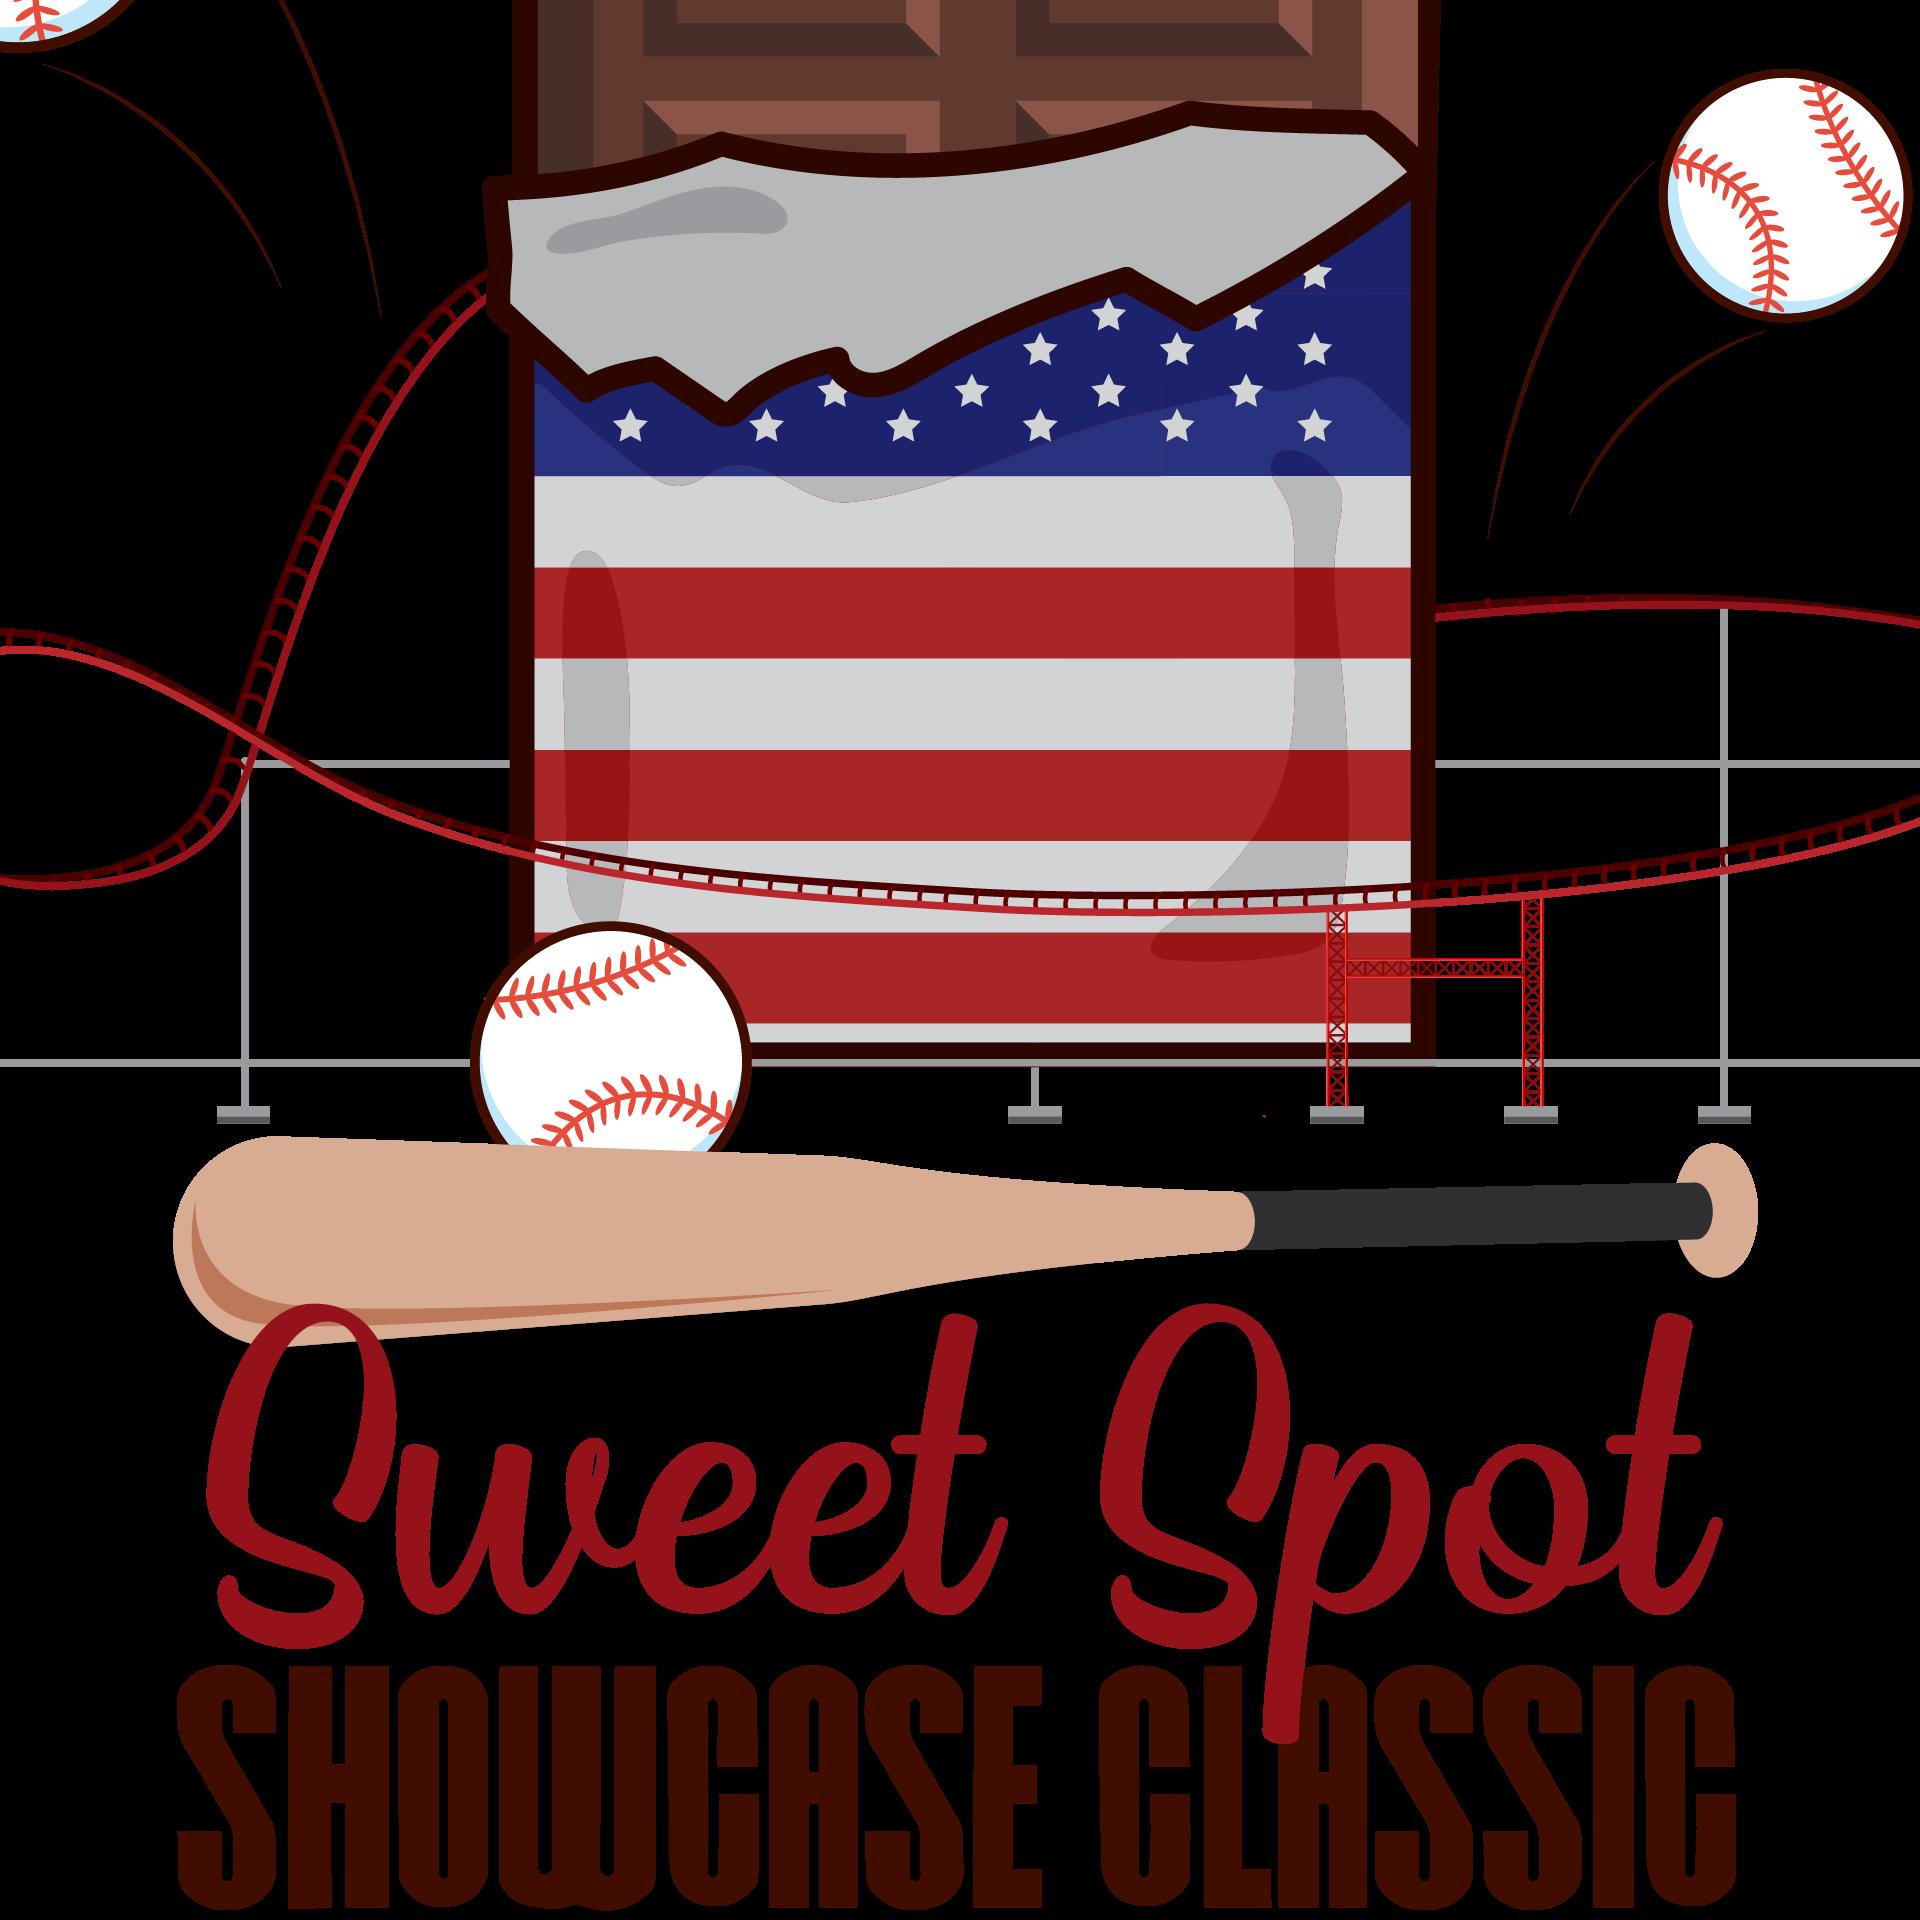 Sweet Spot Showcase Camp